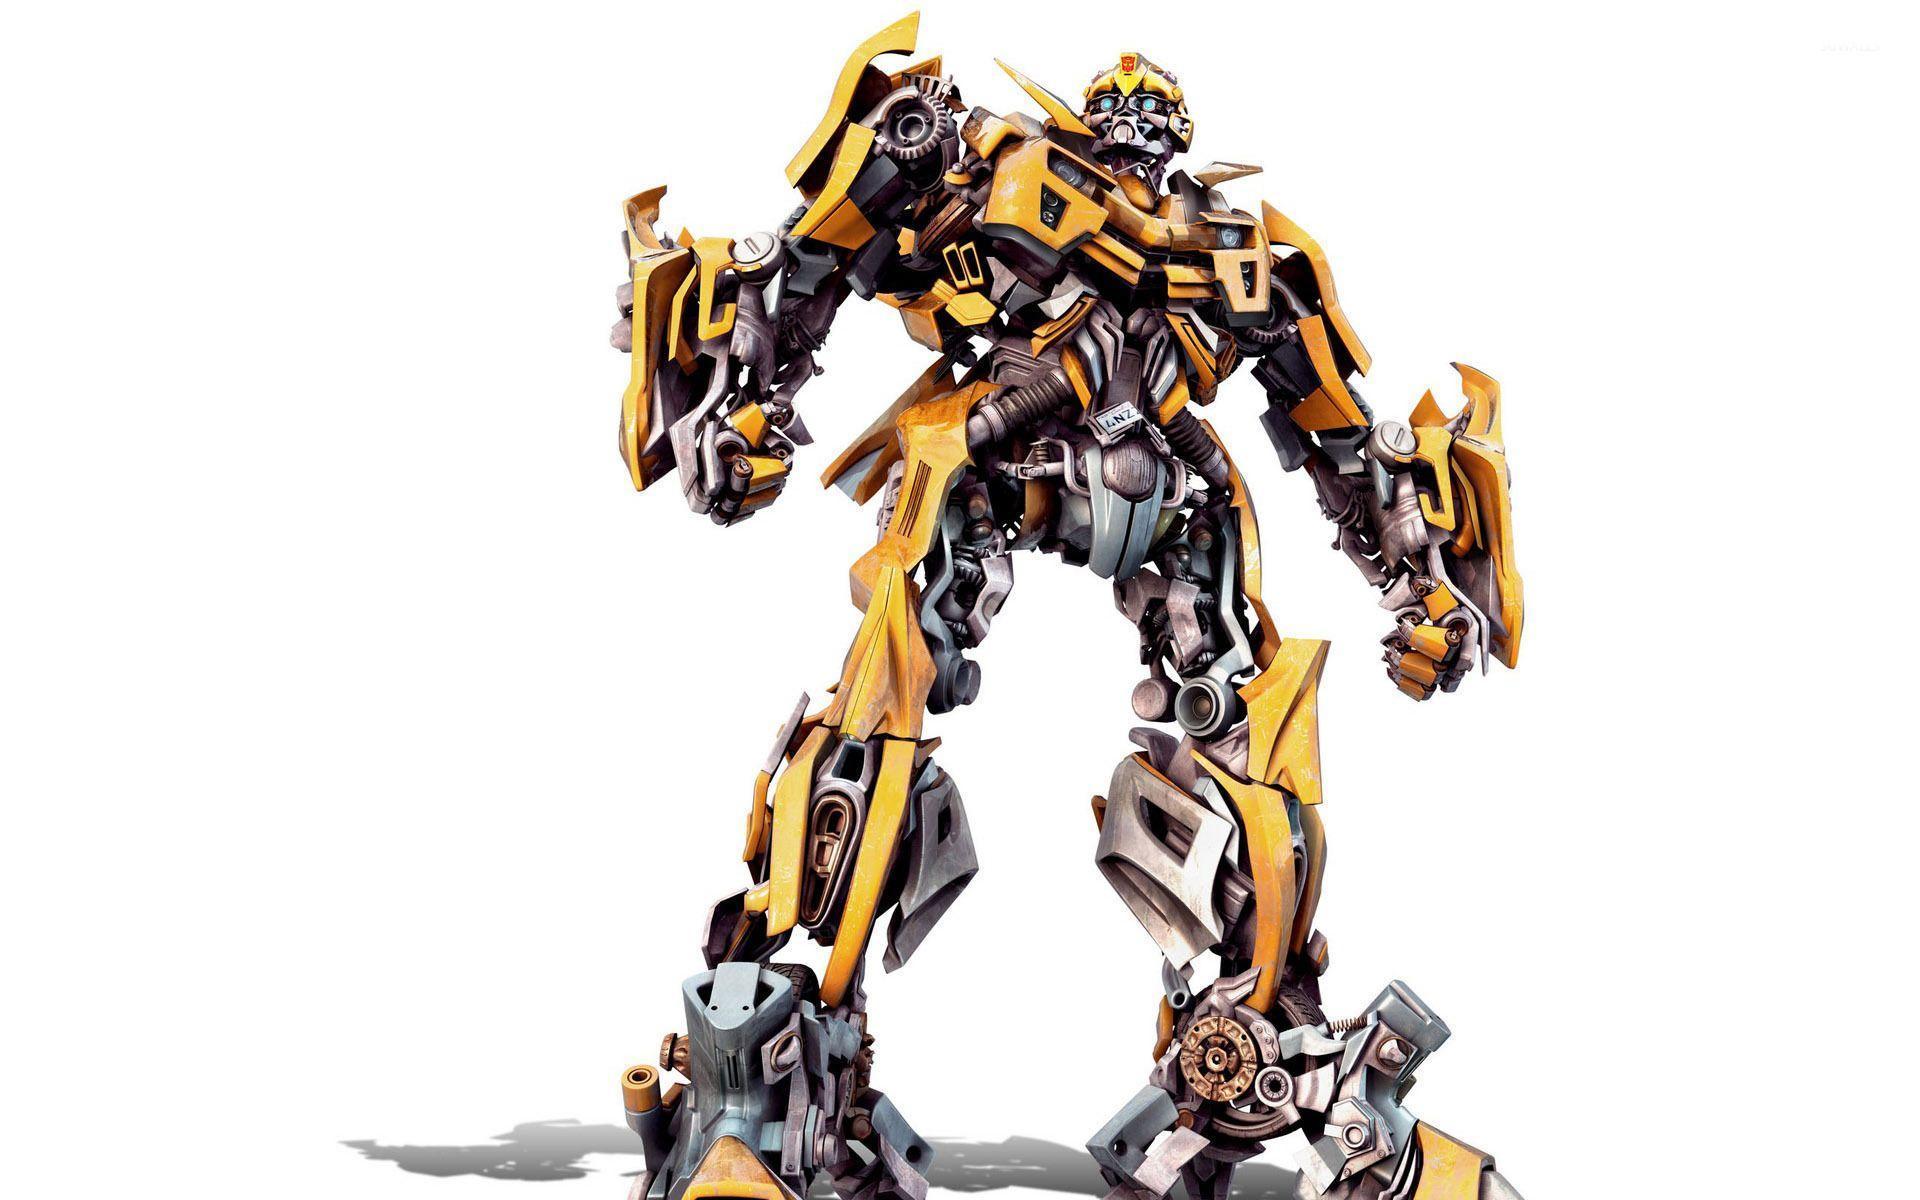 Transformers 5 Bumblebee